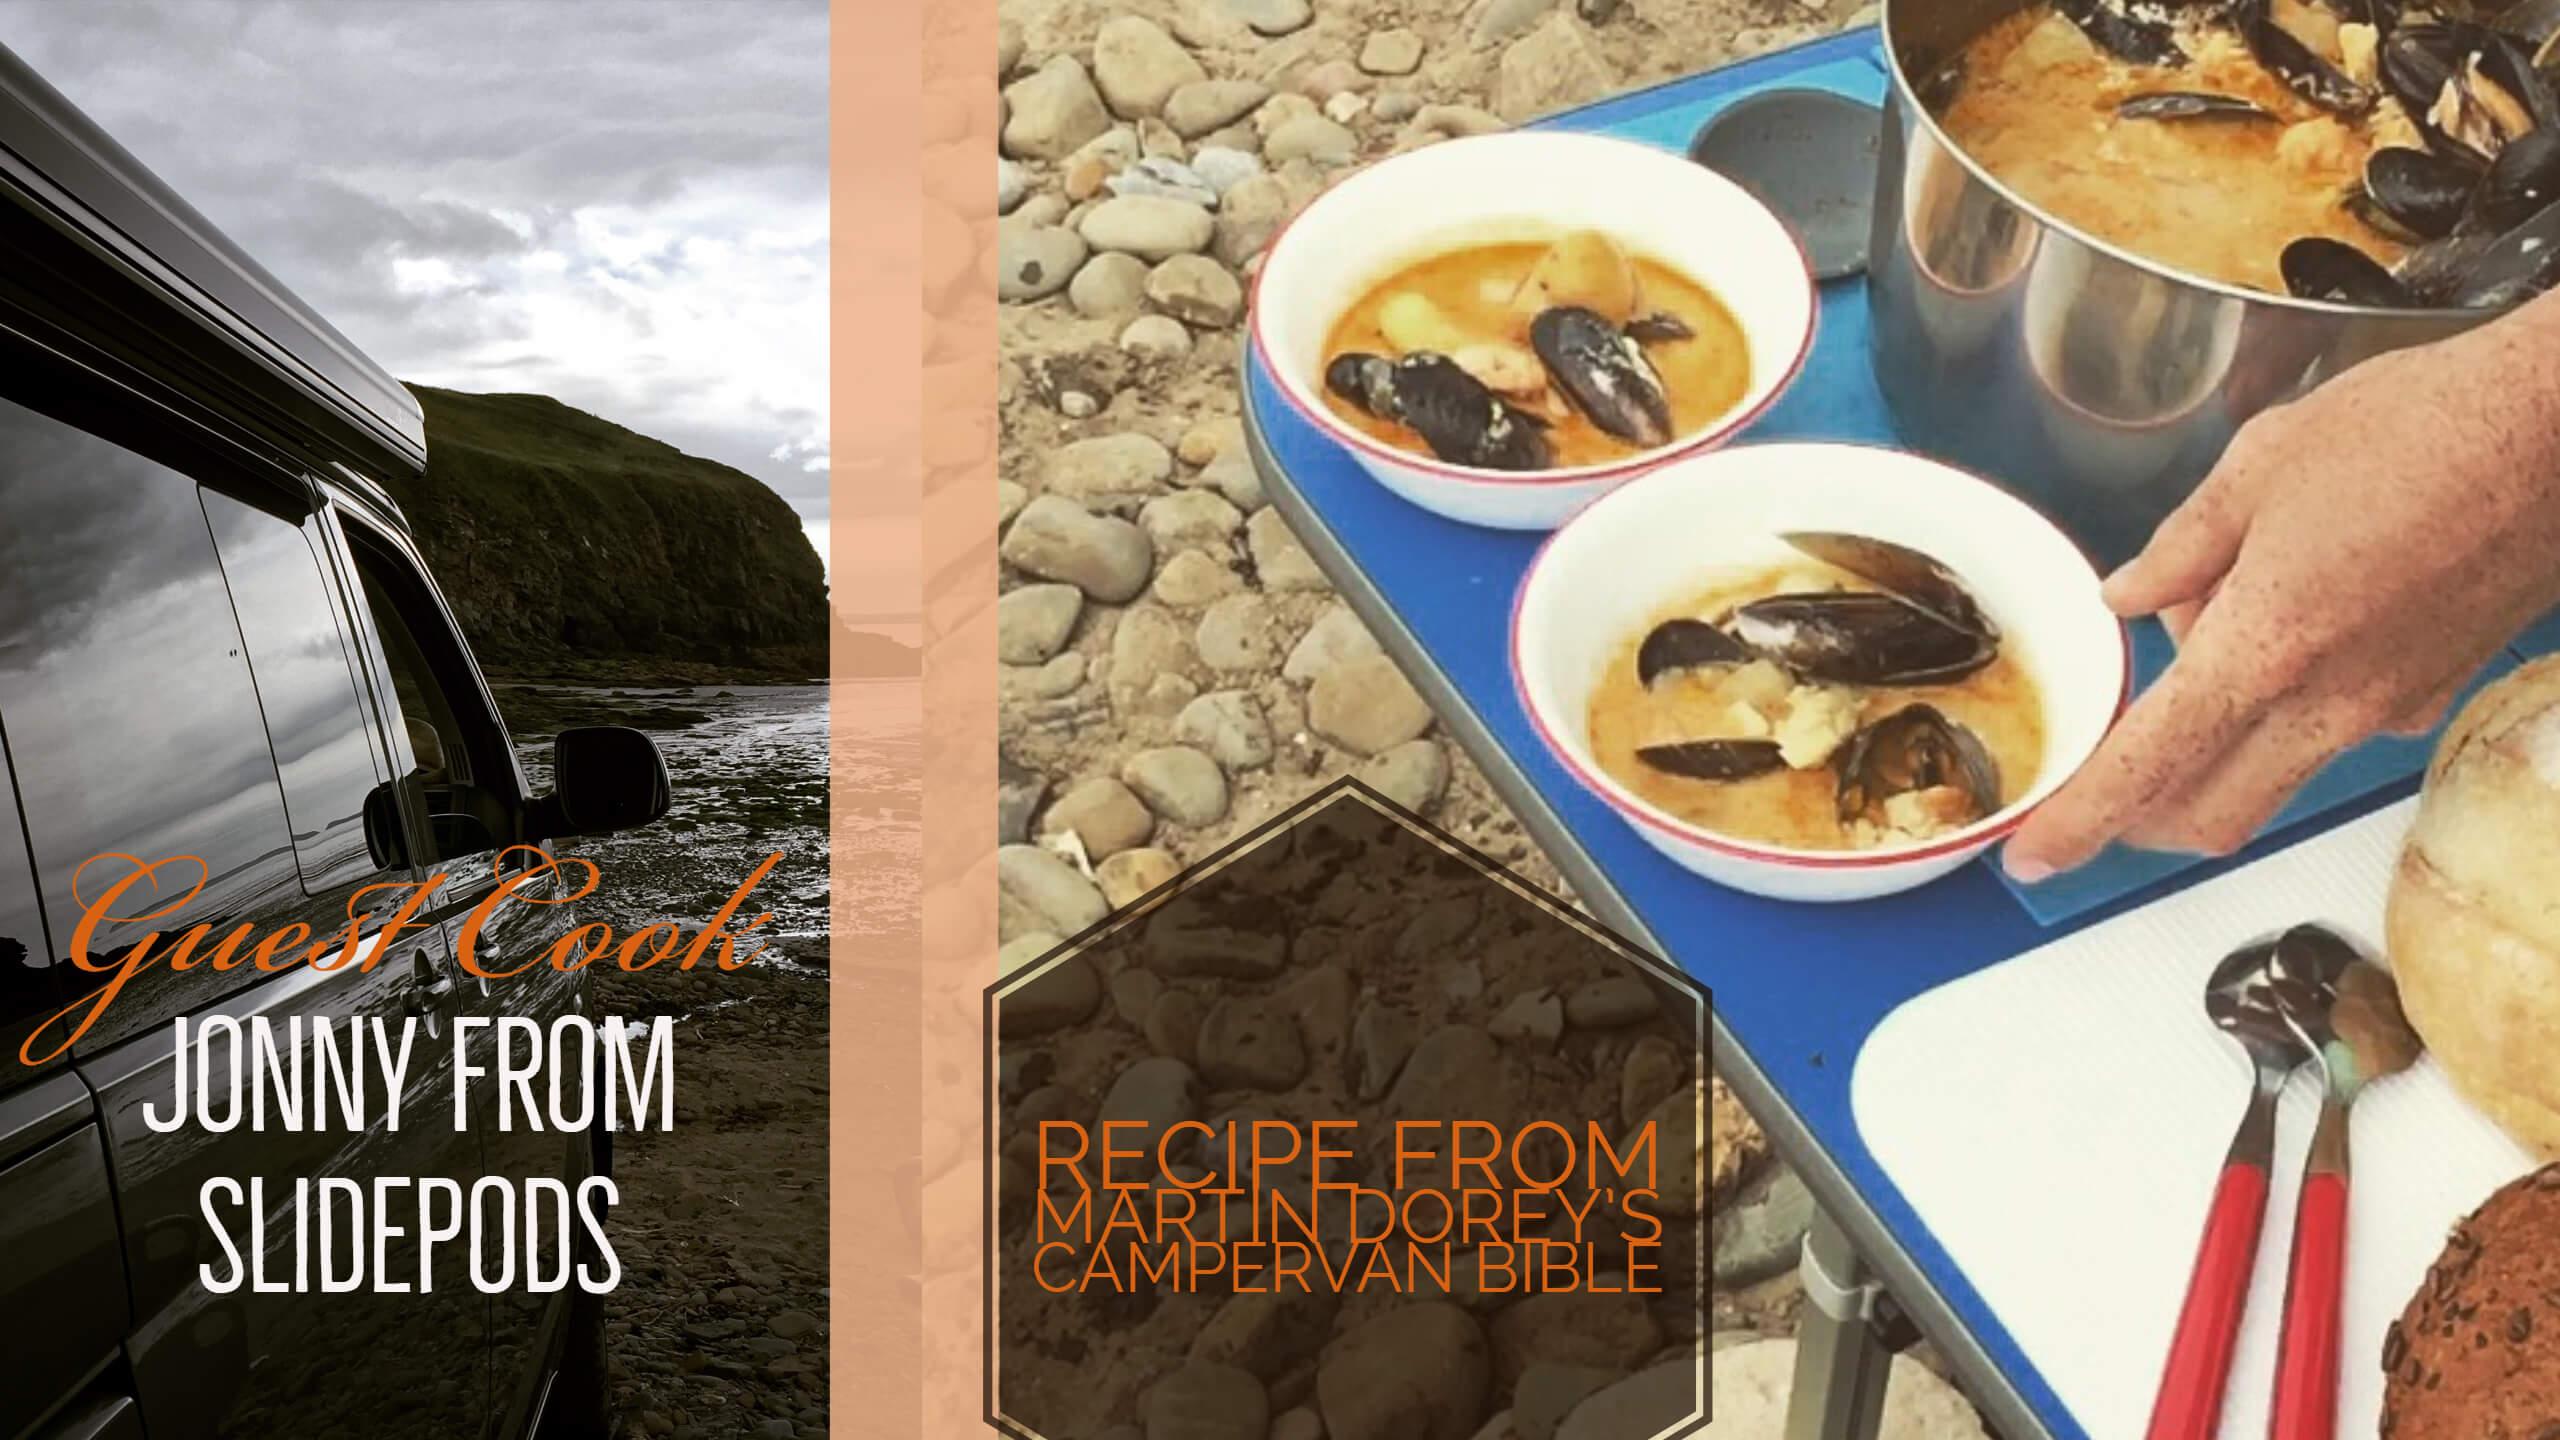 Sweetcorn and seafood chowder recipe